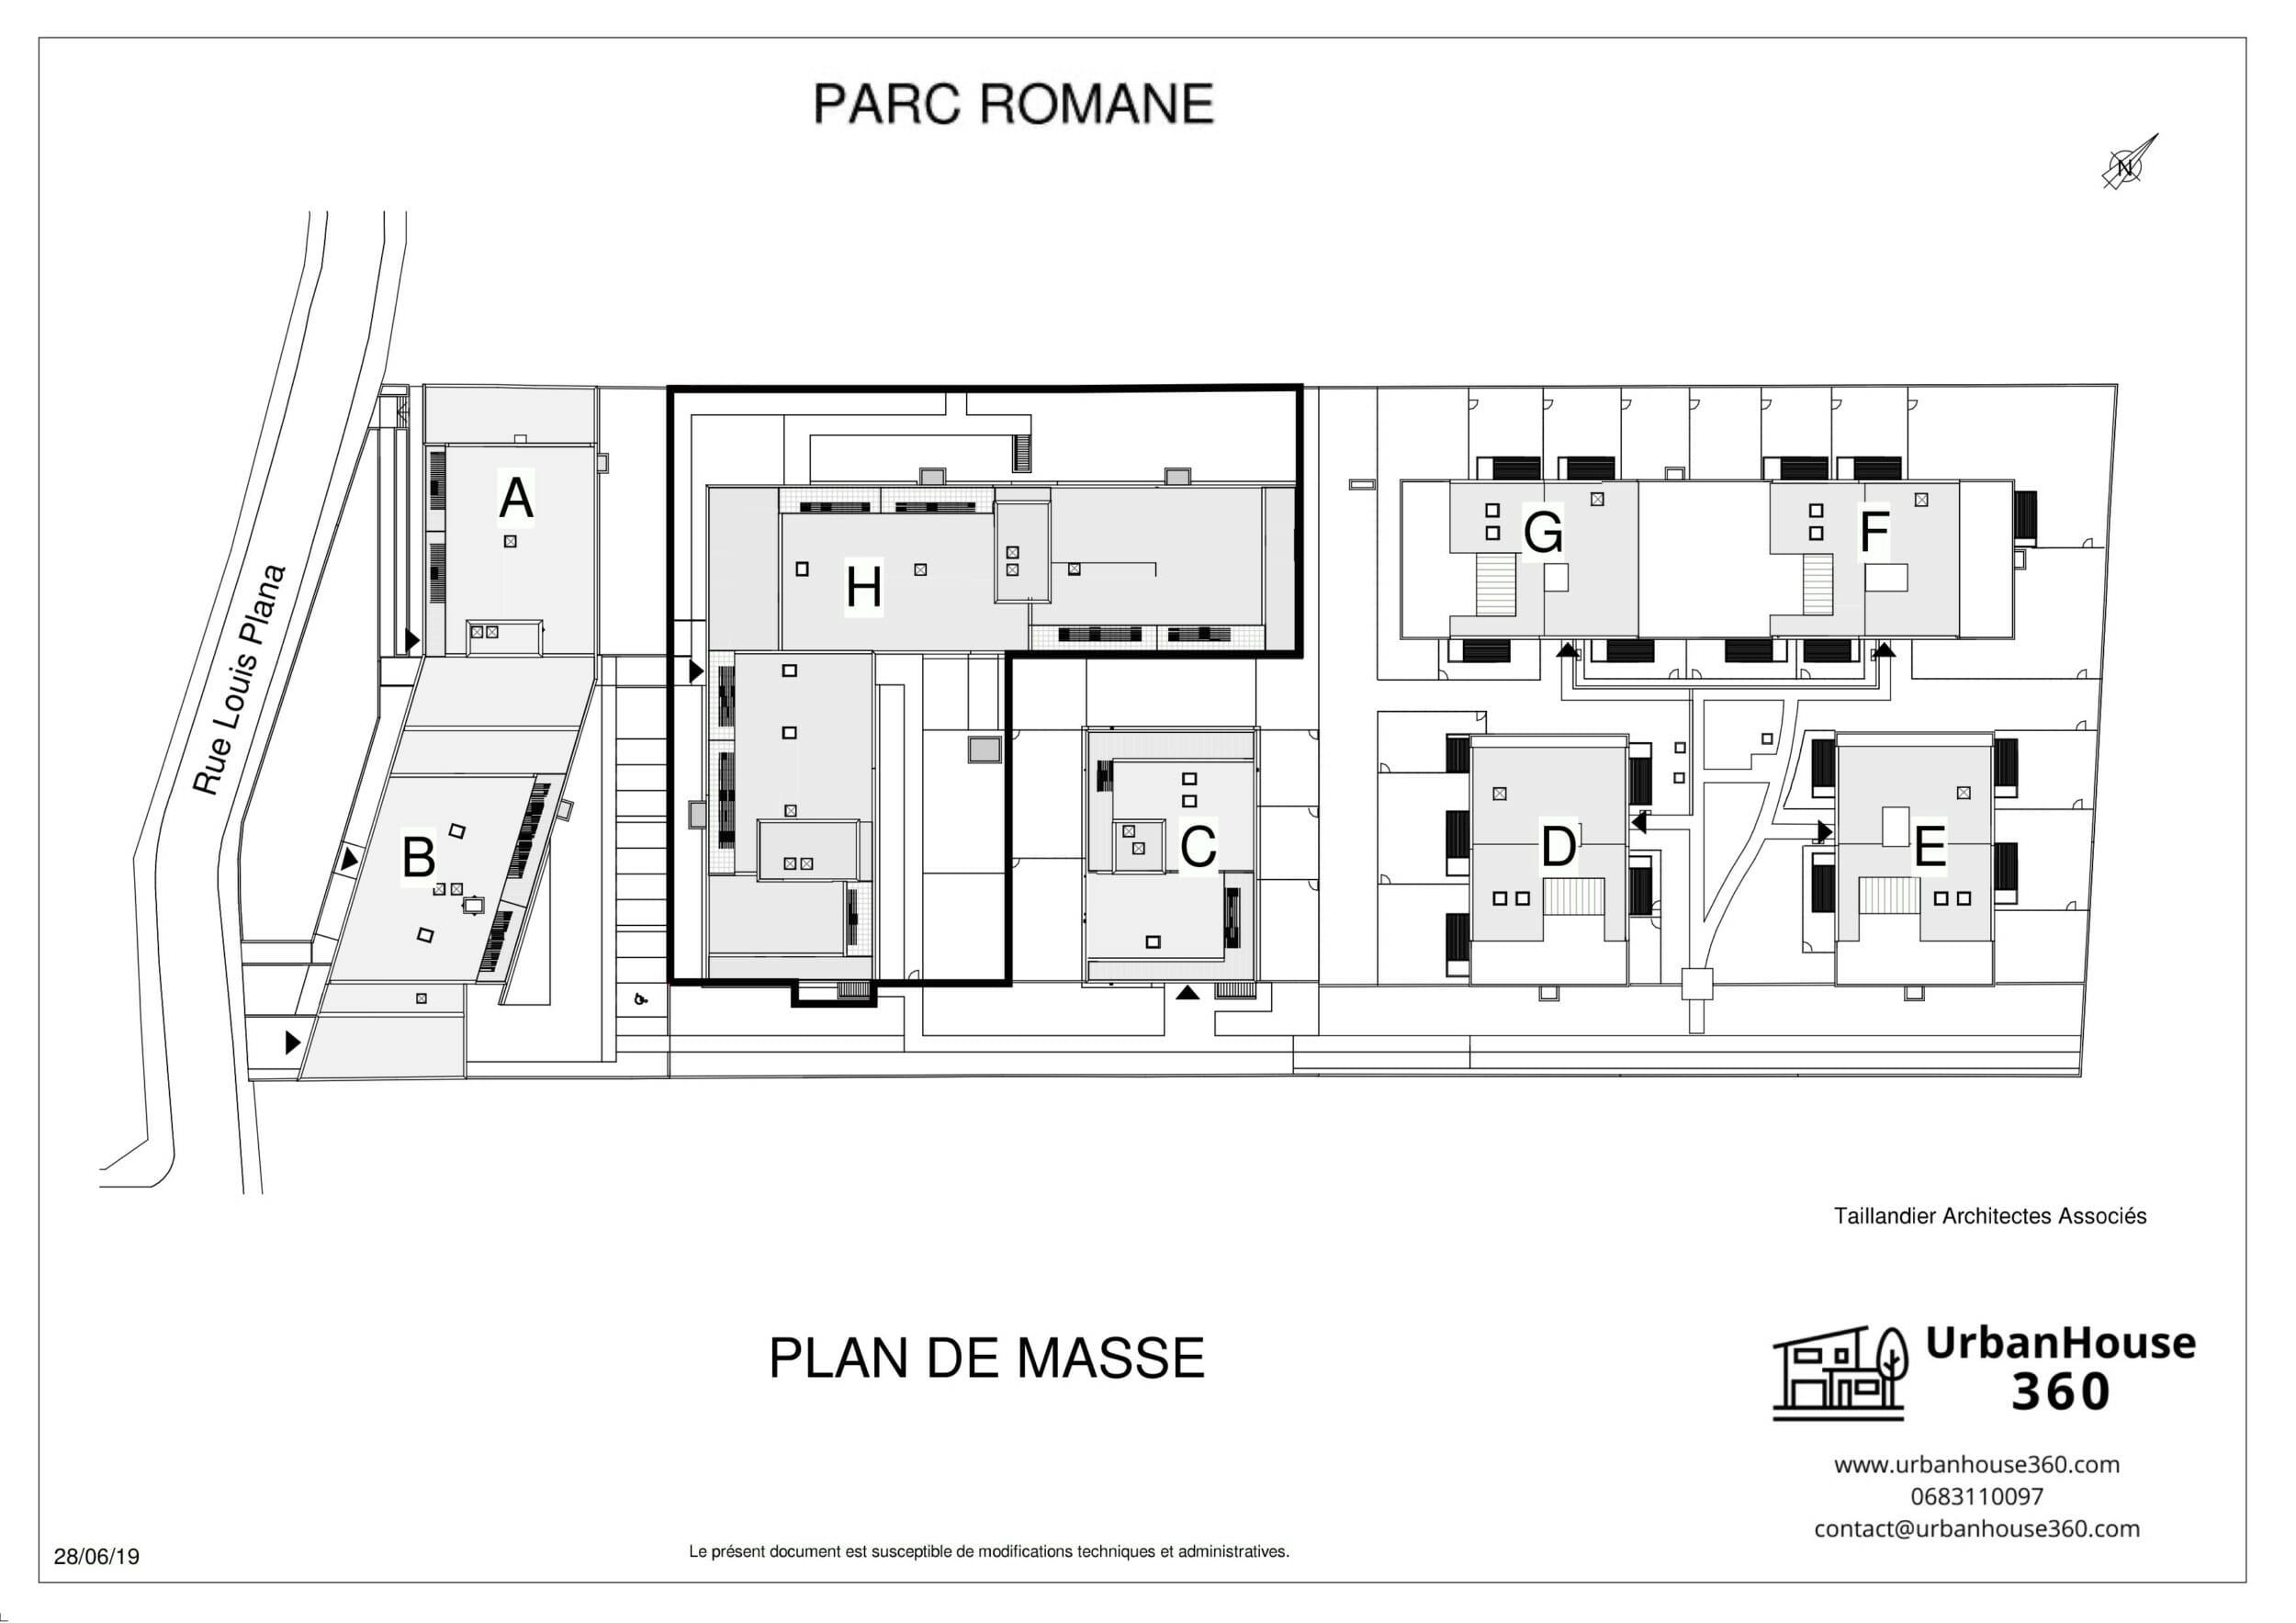 UrbanHouse360-plan_de_masse-parc_romane